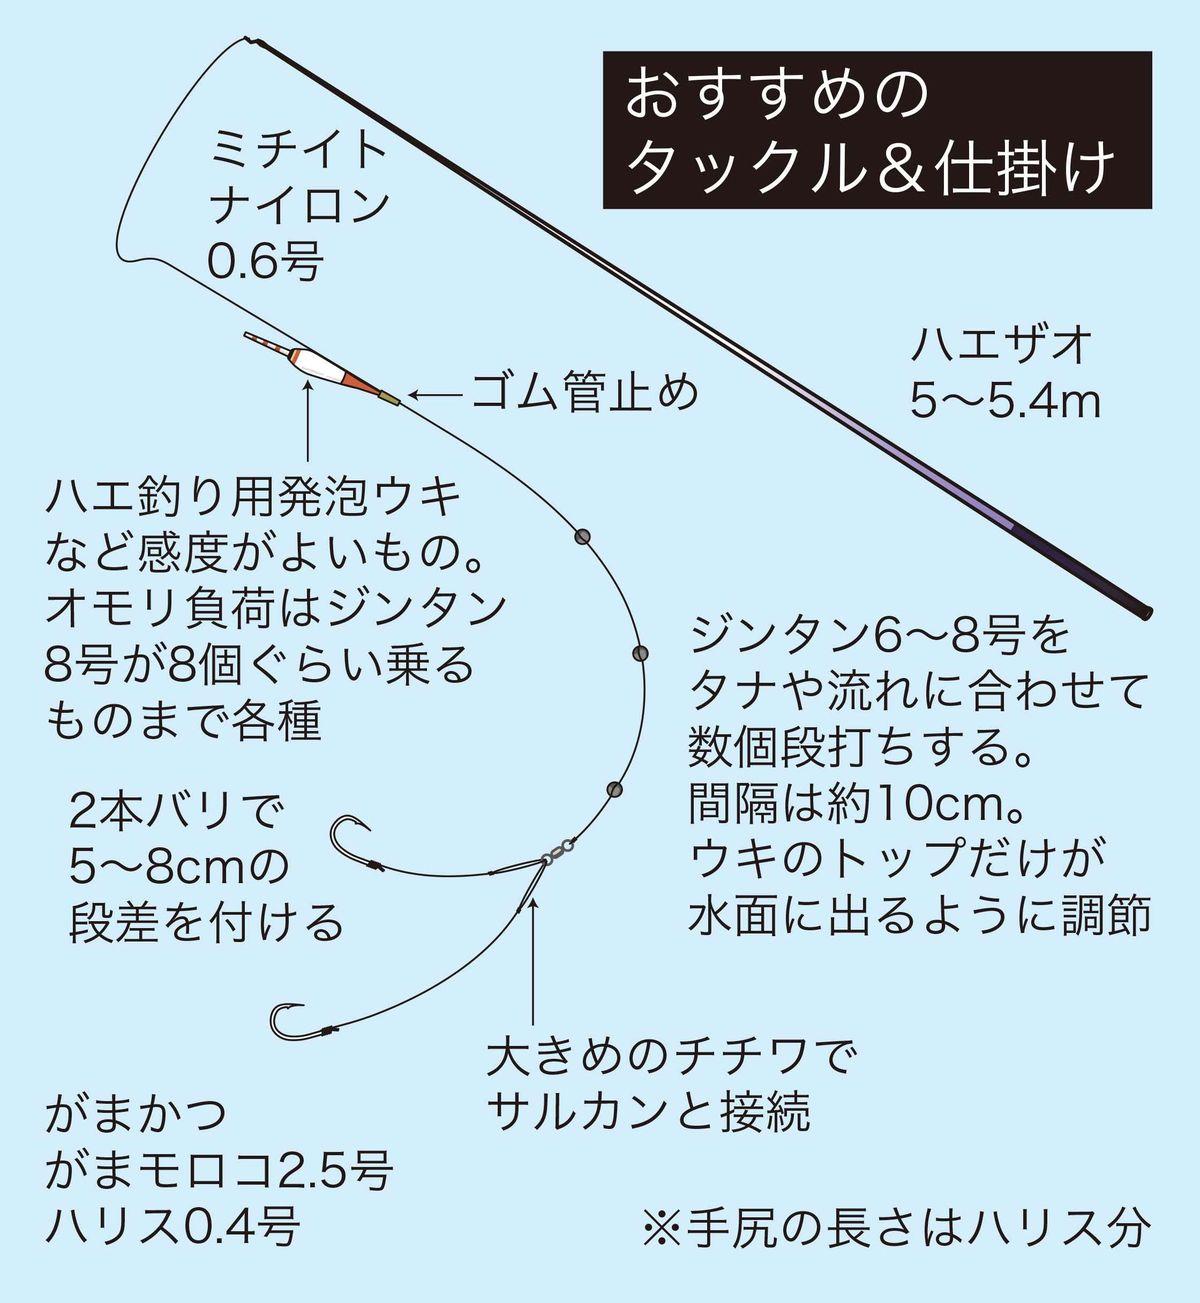 078-101_zenkokutsuribaGW06_cs6 (3)